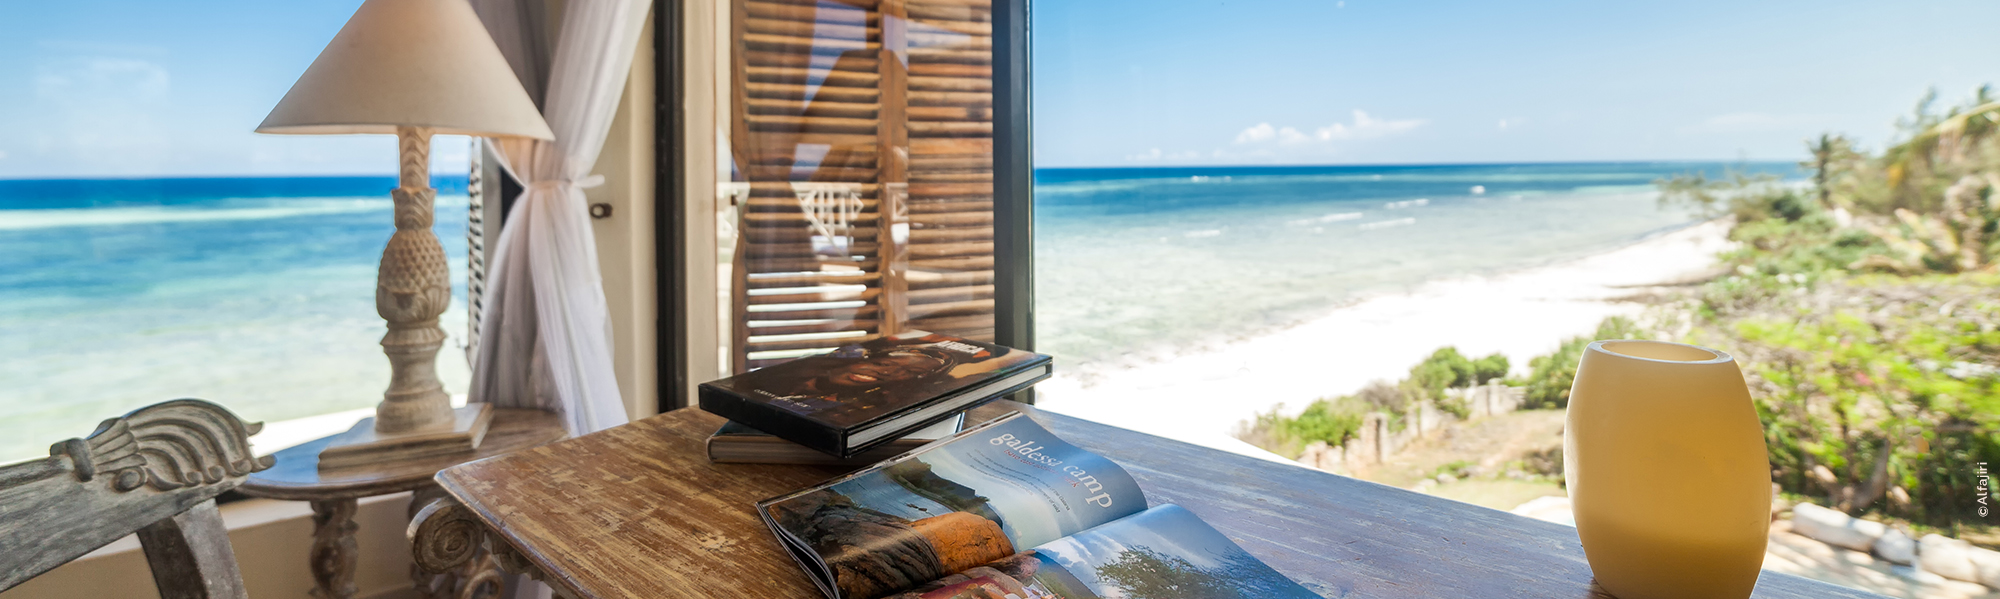 Kenia - Luxusurlaub & Lodge am Meer